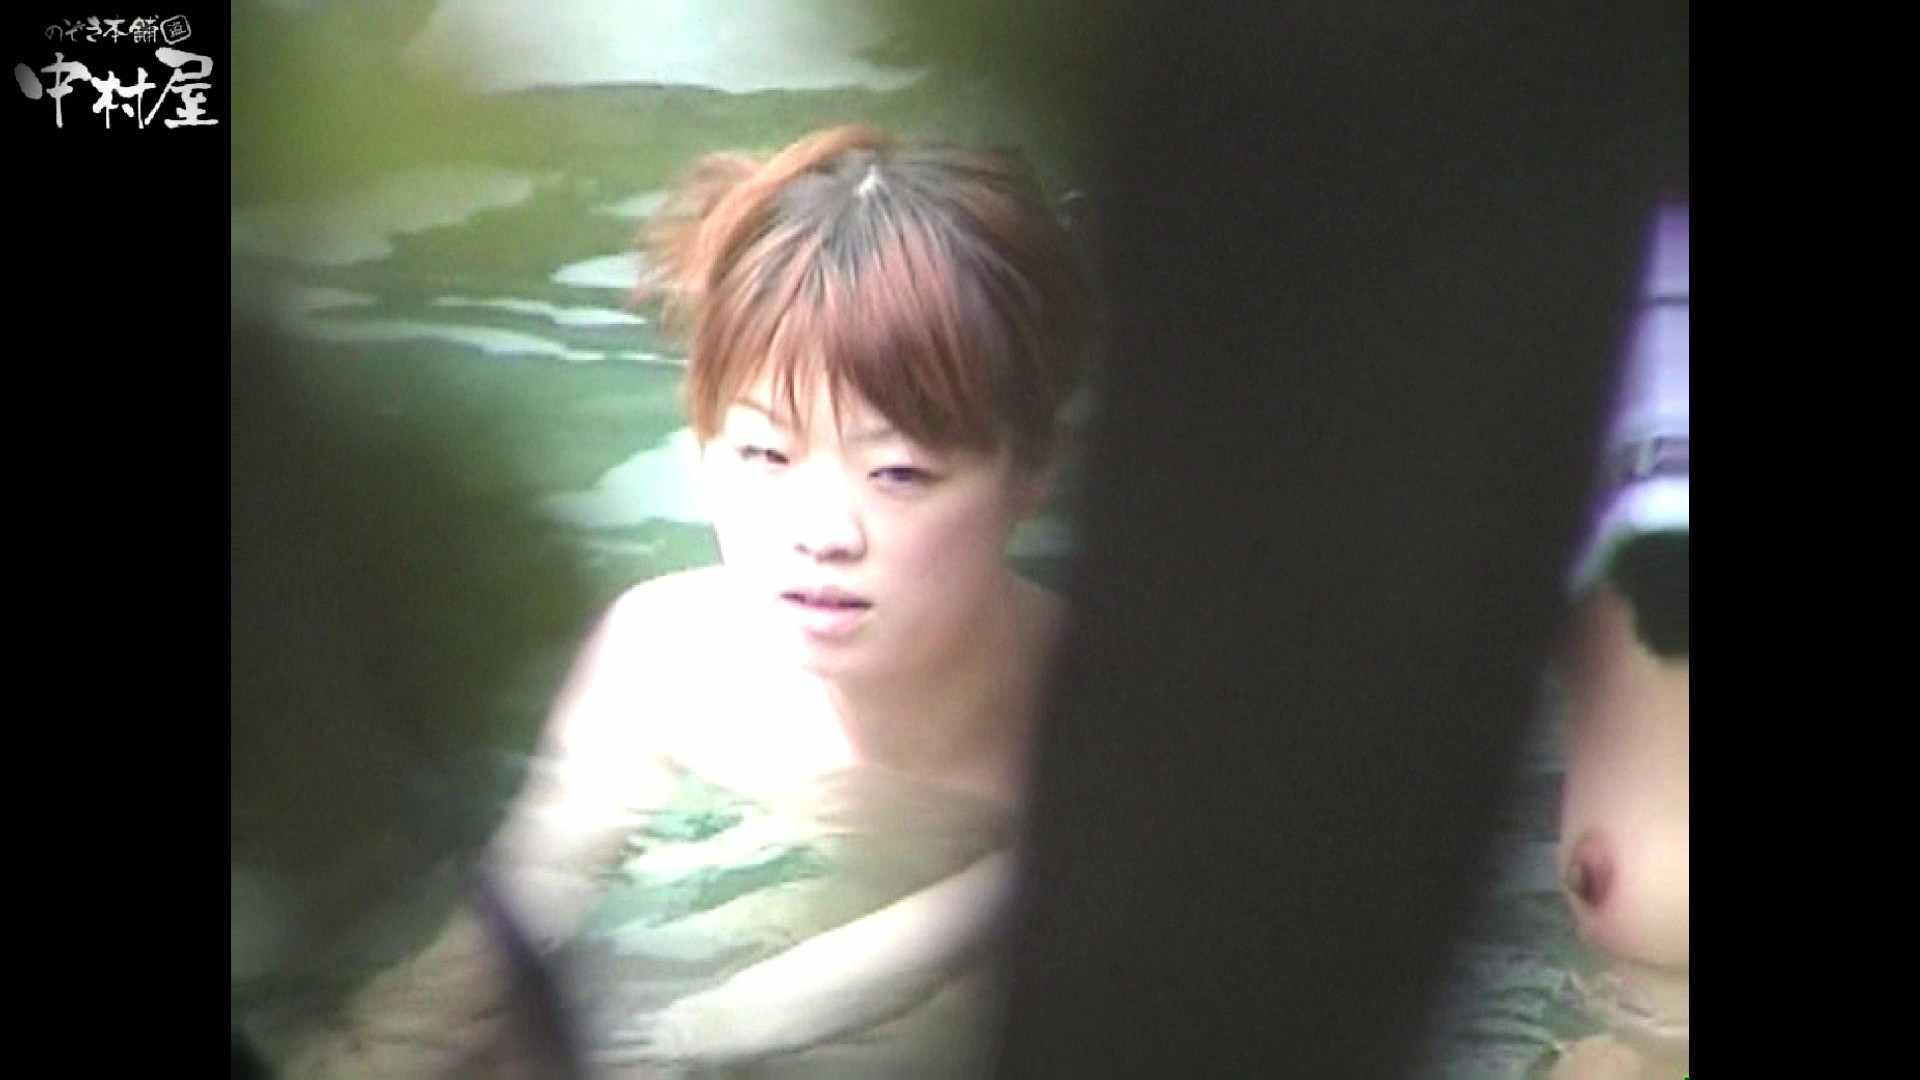 Aquaな露天風呂Vol.954 露天風呂編  111PIX 52